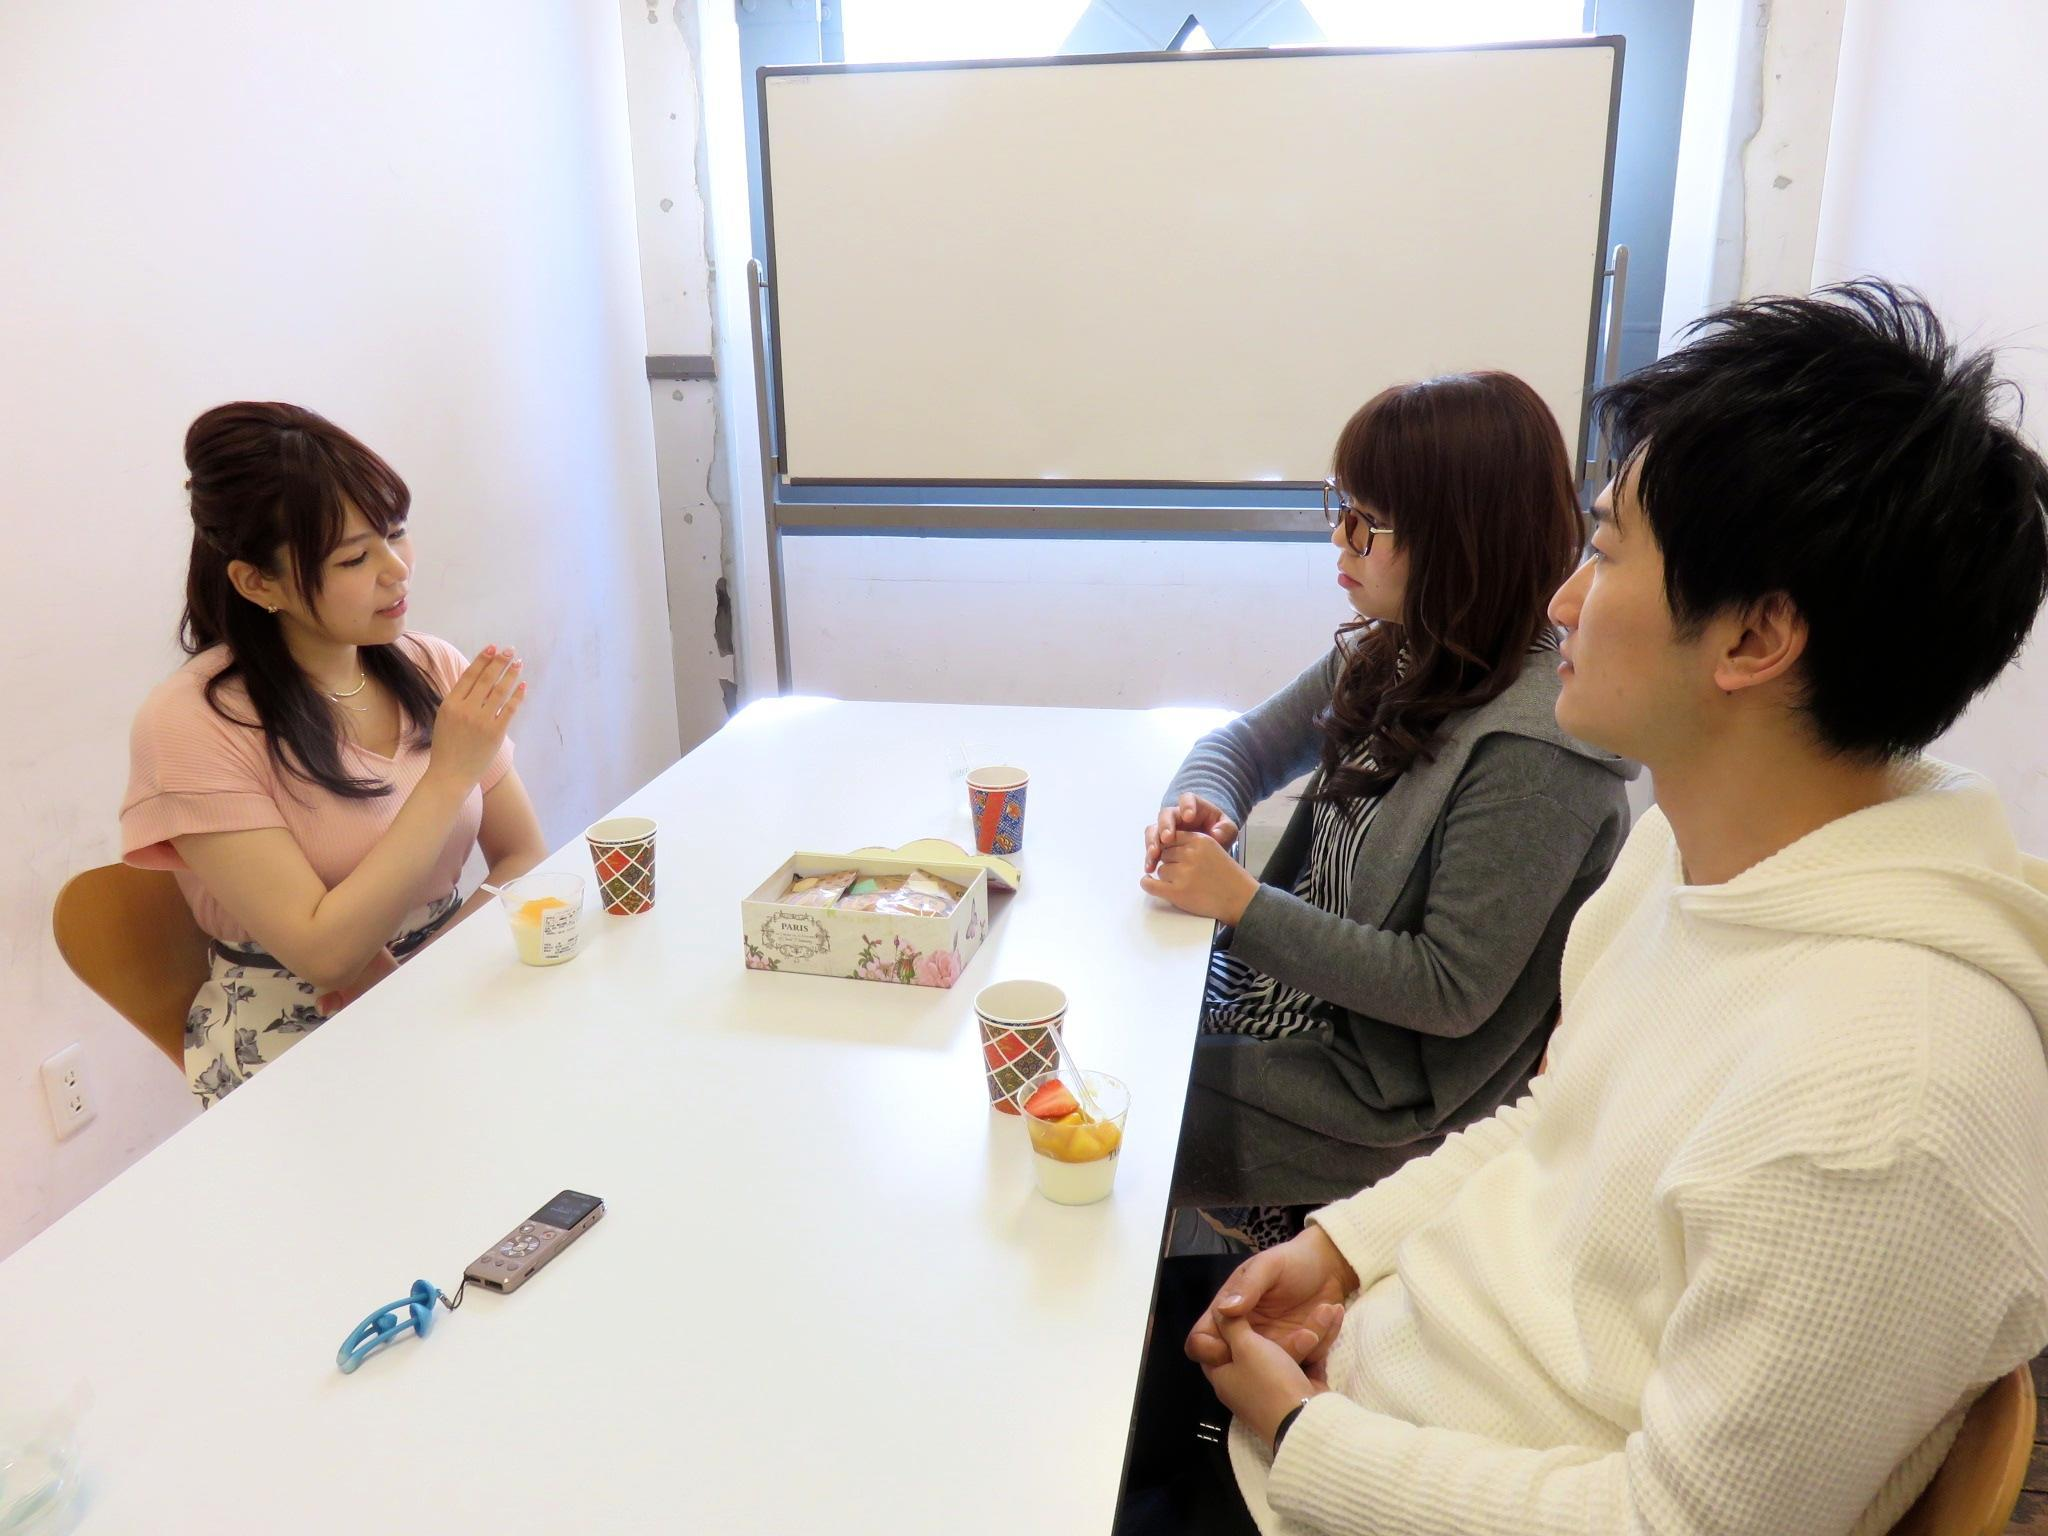 http://news.yoshimoto.co.jp/20170224191756-f38f0974cd183bf39e2a421b0ca1dd95ea5f8995.jpg